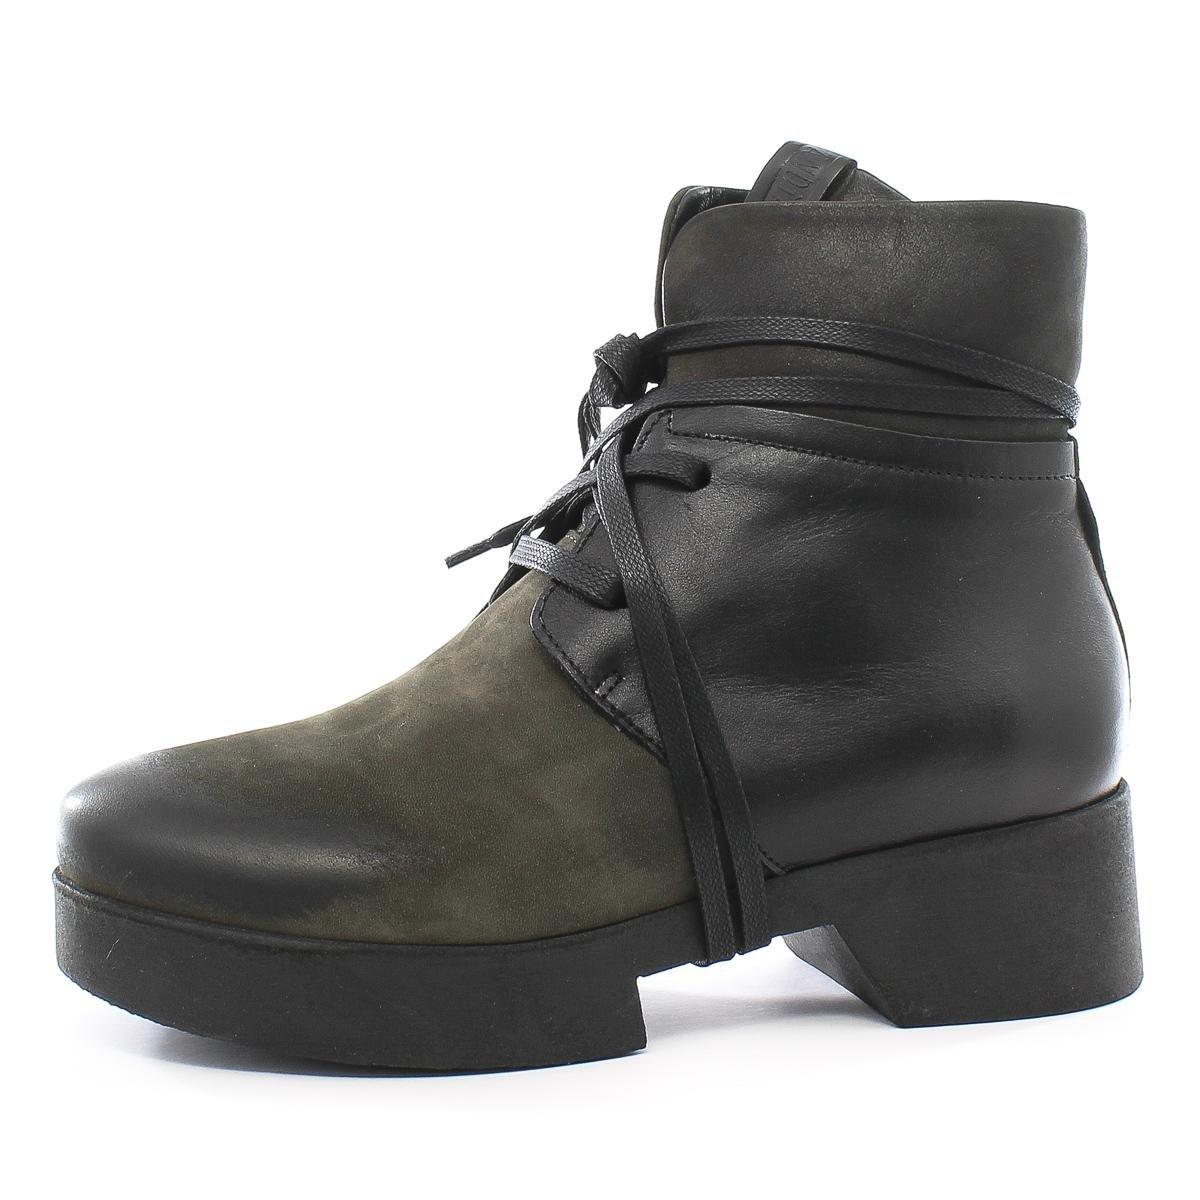 Andia Talons Fora Boots à Talons Andia Maeda Samurai Nero I-Nabuk  AntraciteB07543BC7WParent 9f3b77 756a0a029d51